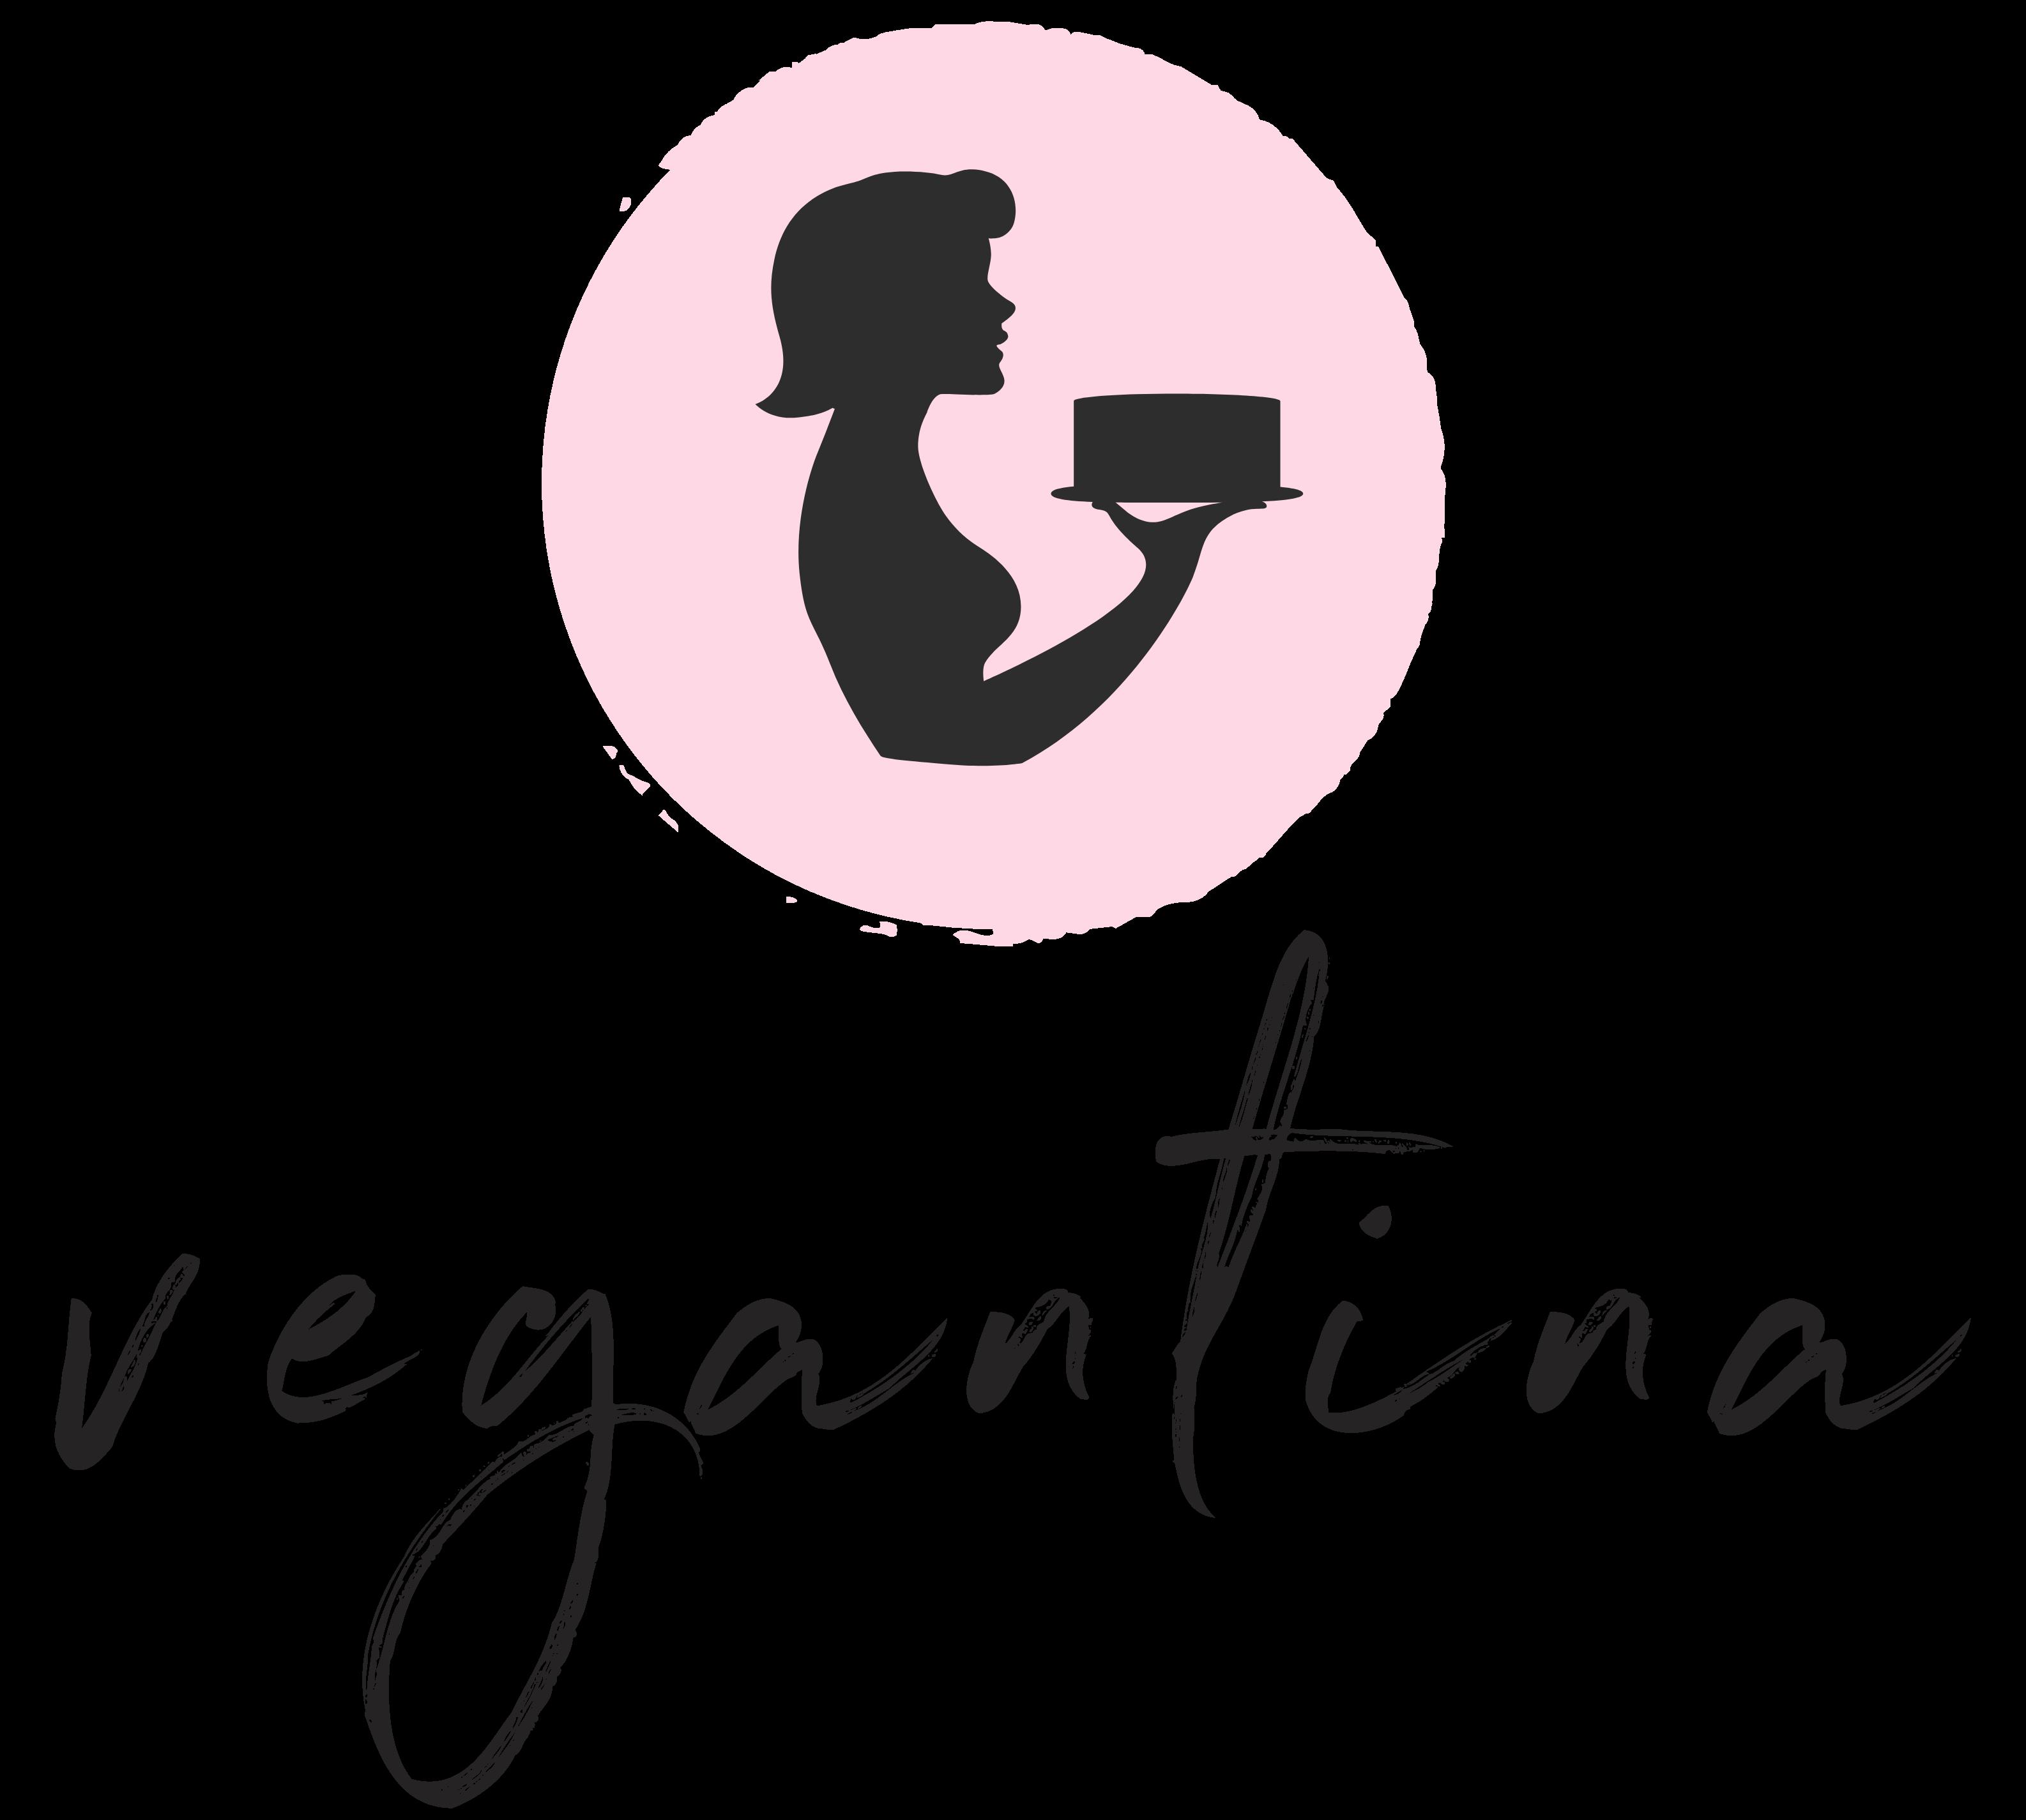 Vegantina